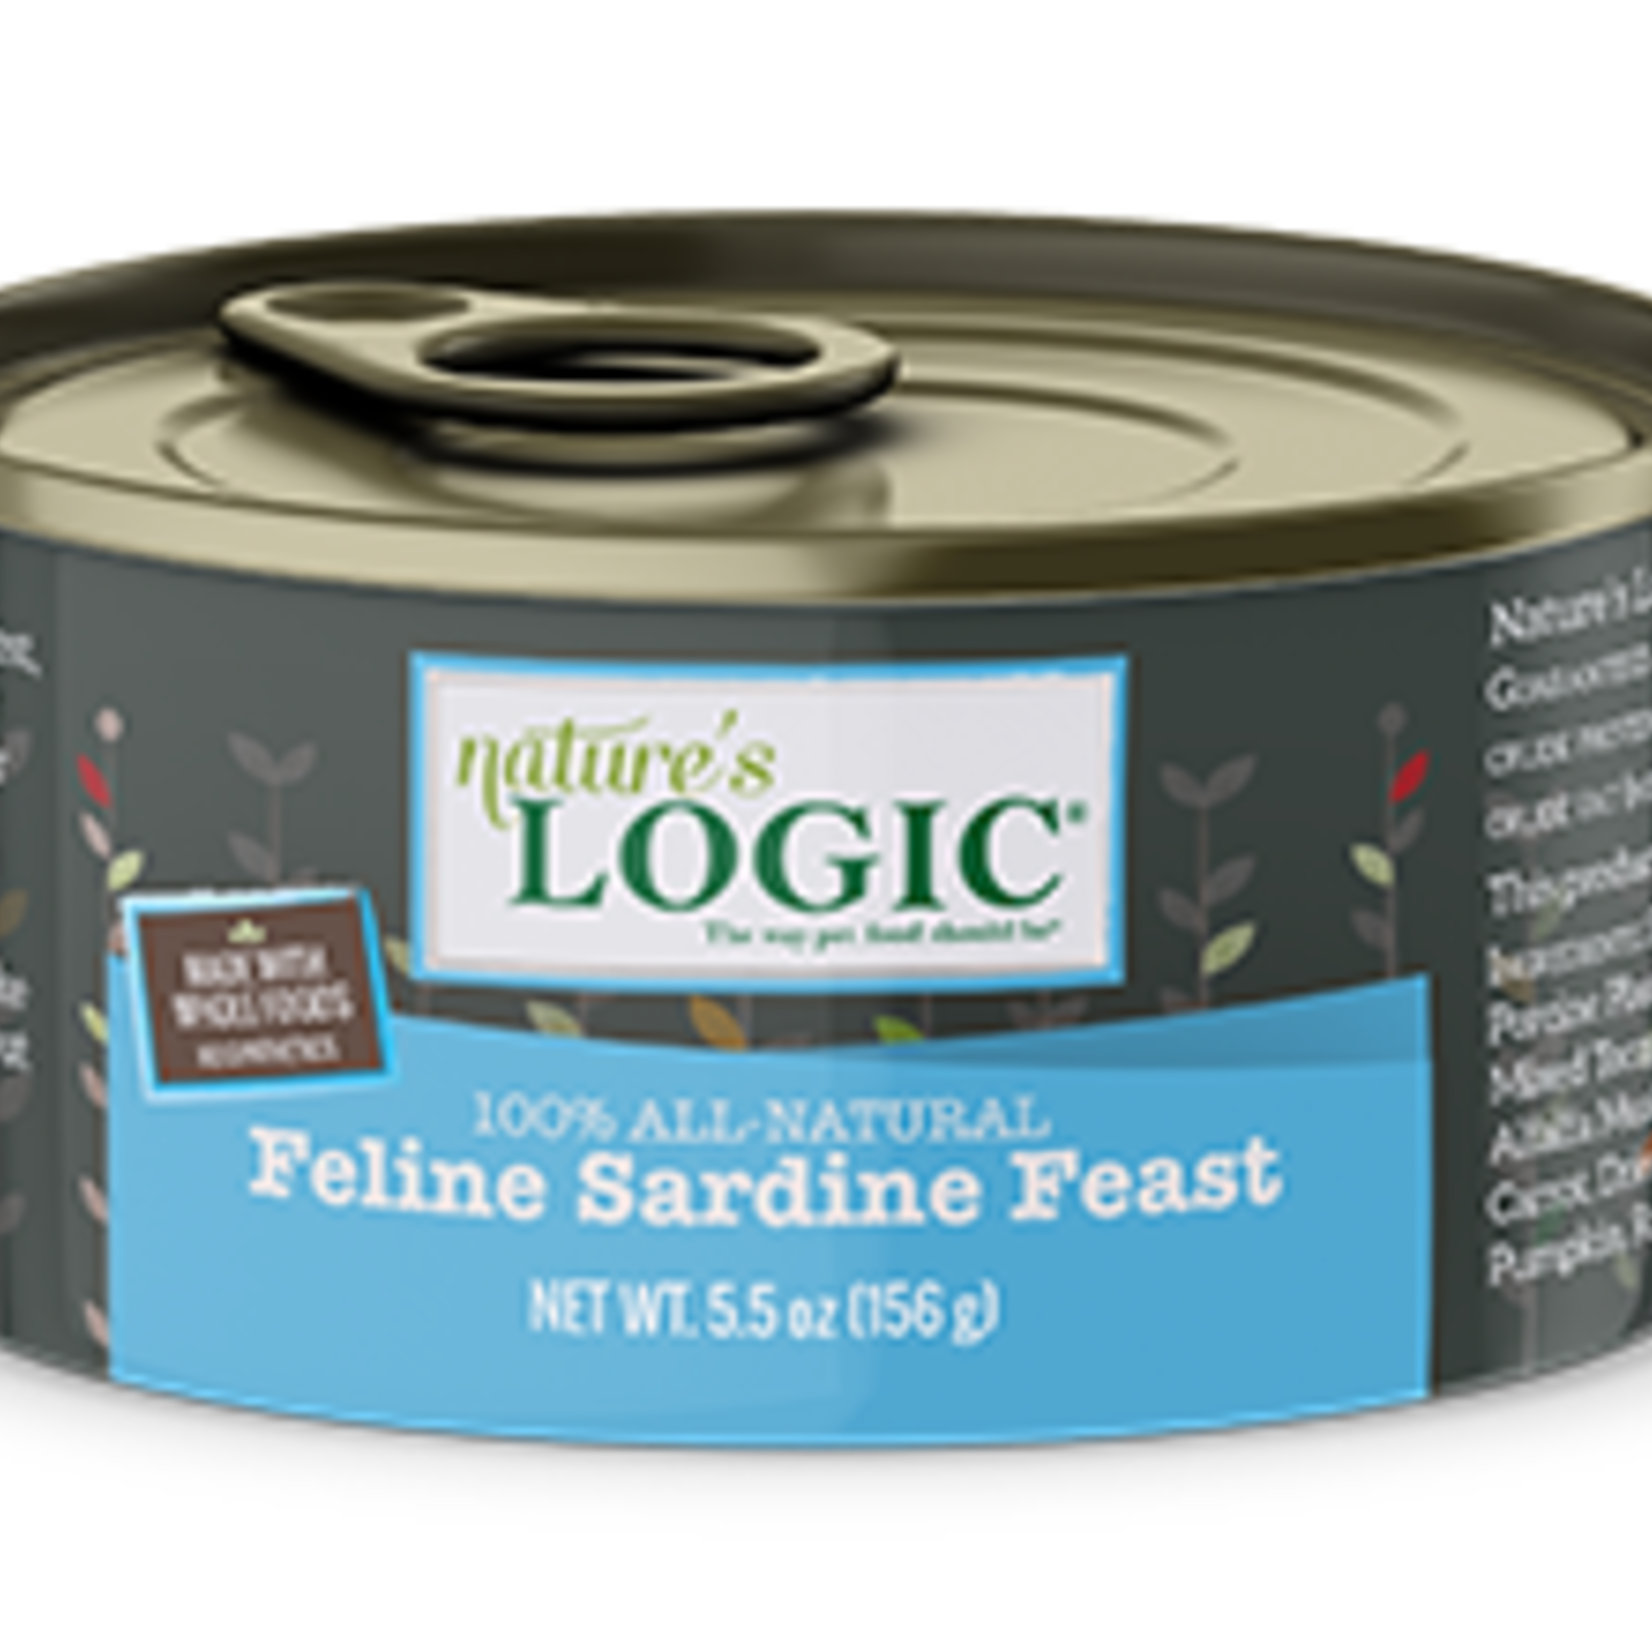 Natures Logic Natures Logic Cat Grain Free Sardine Feast 5.5 OZ